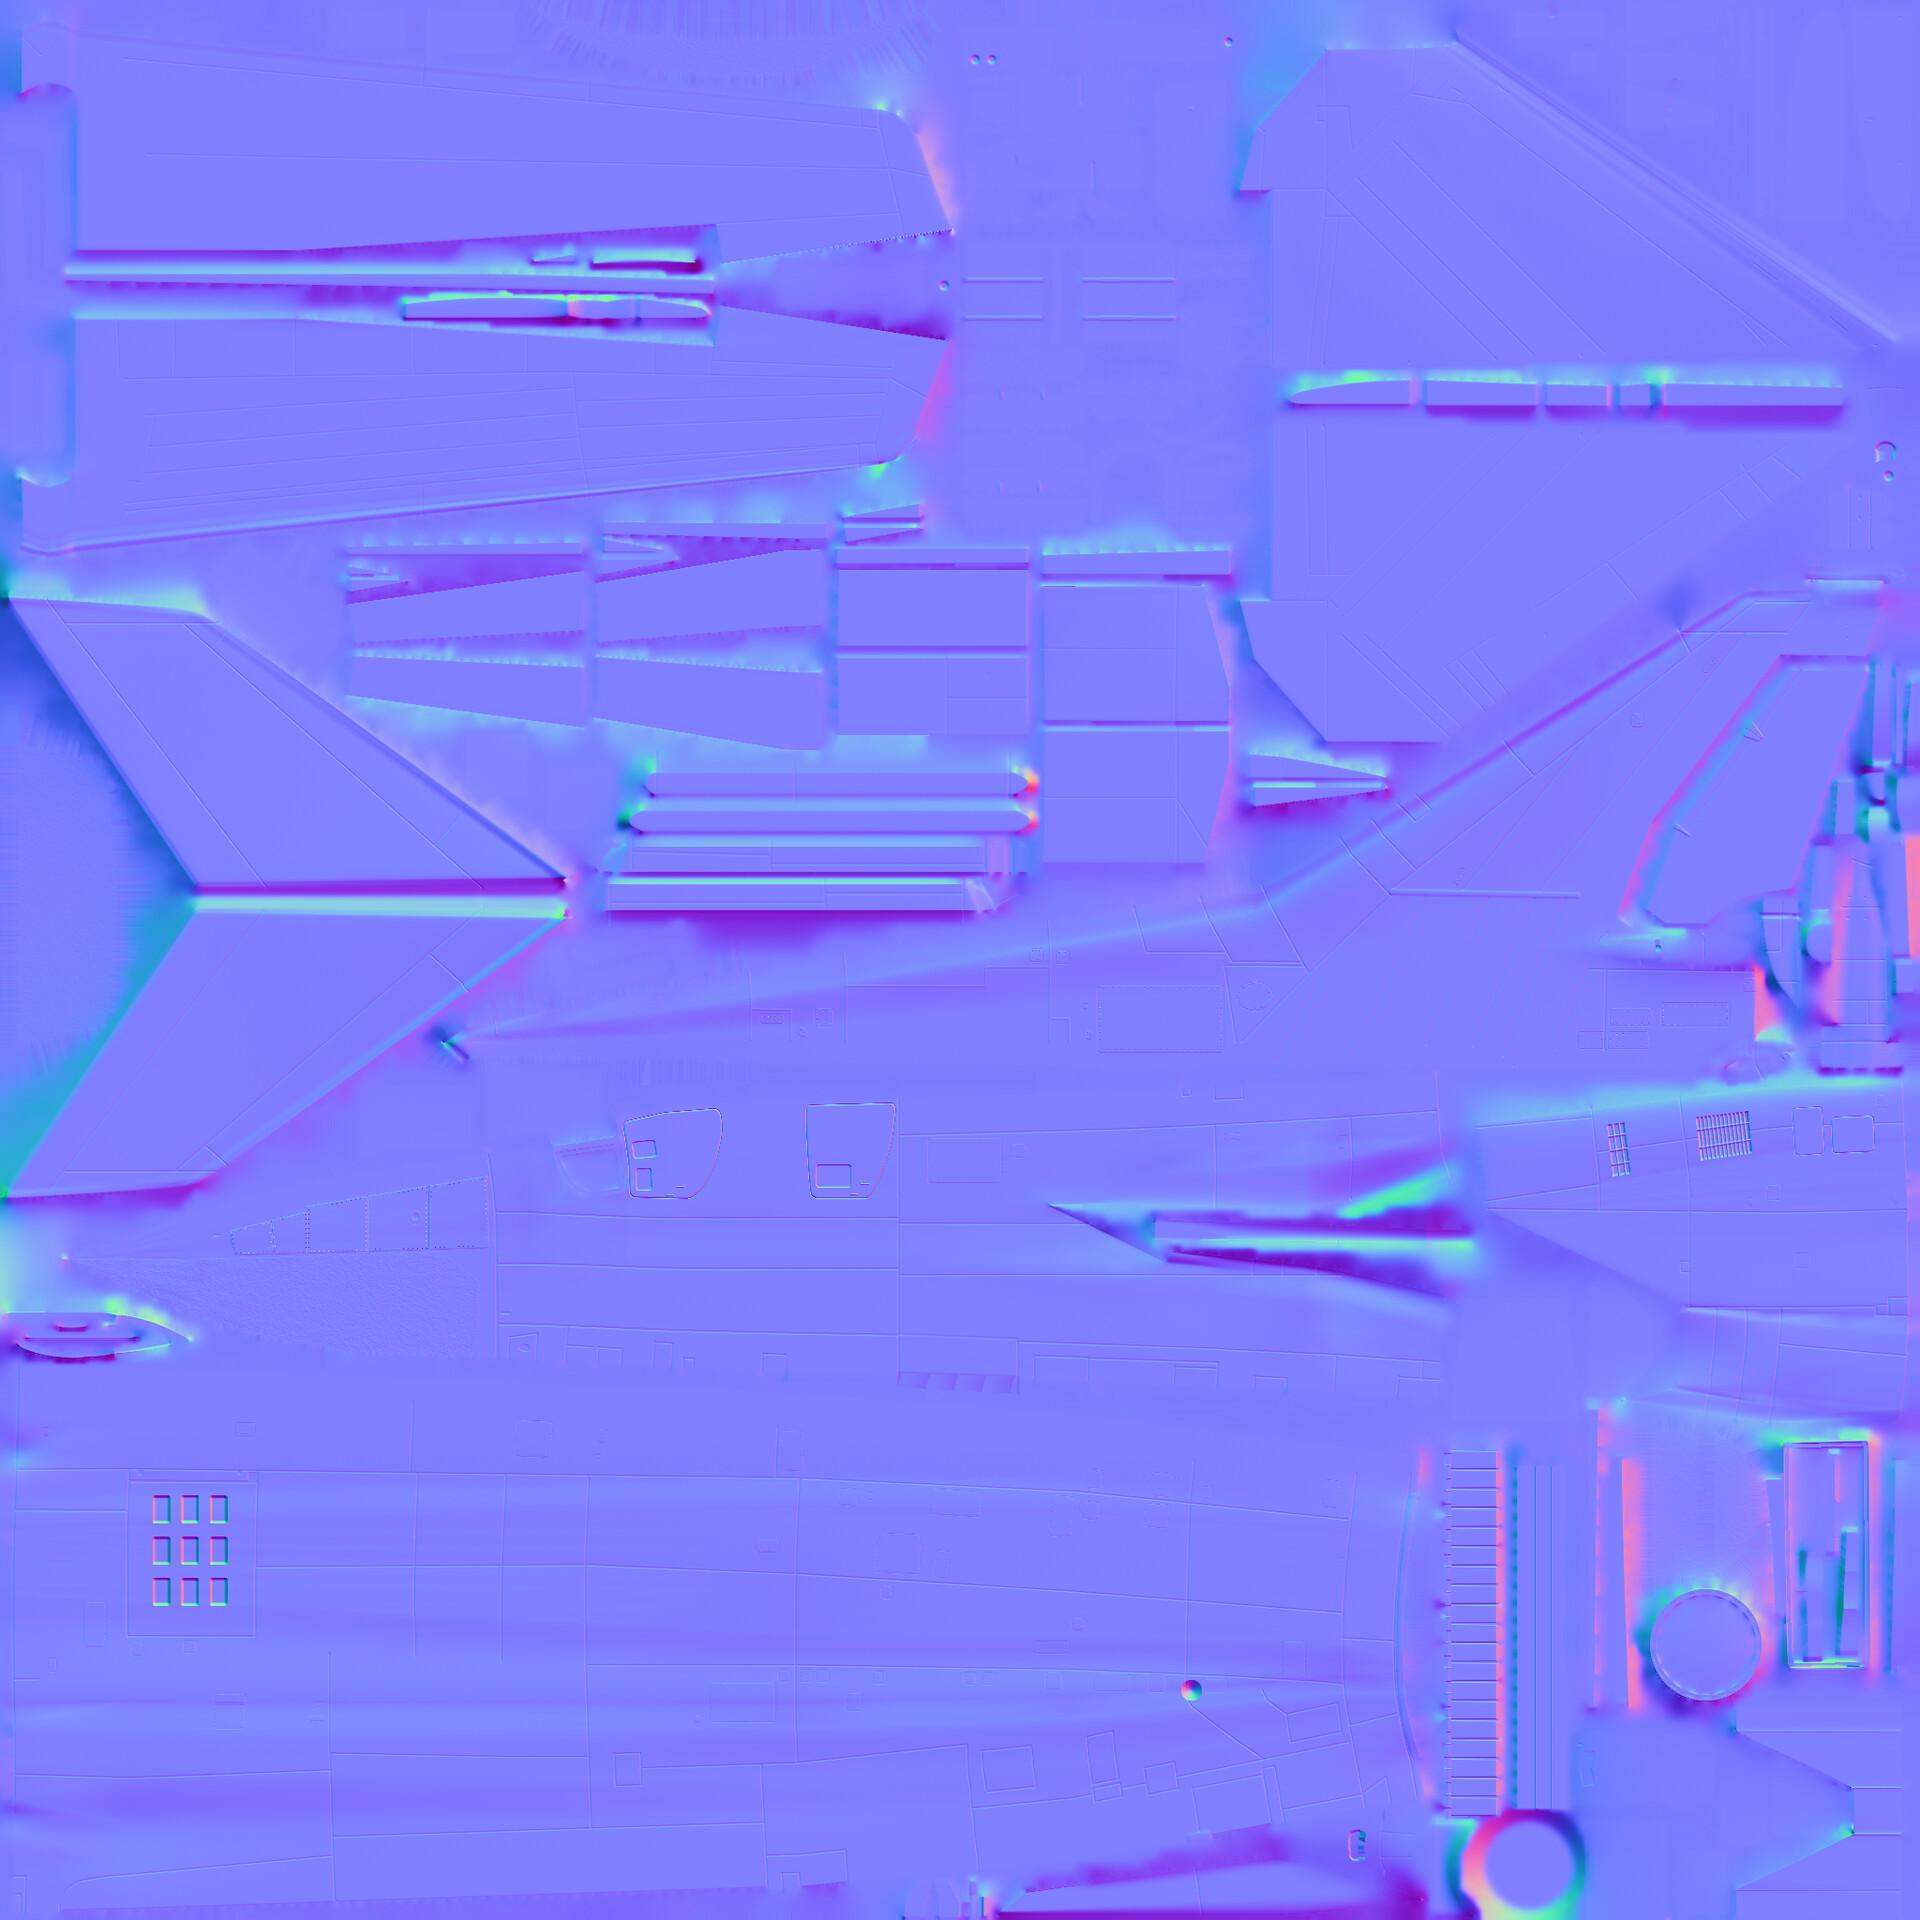 Justin wildhorn tu 22m3 texturenormal v001 jw